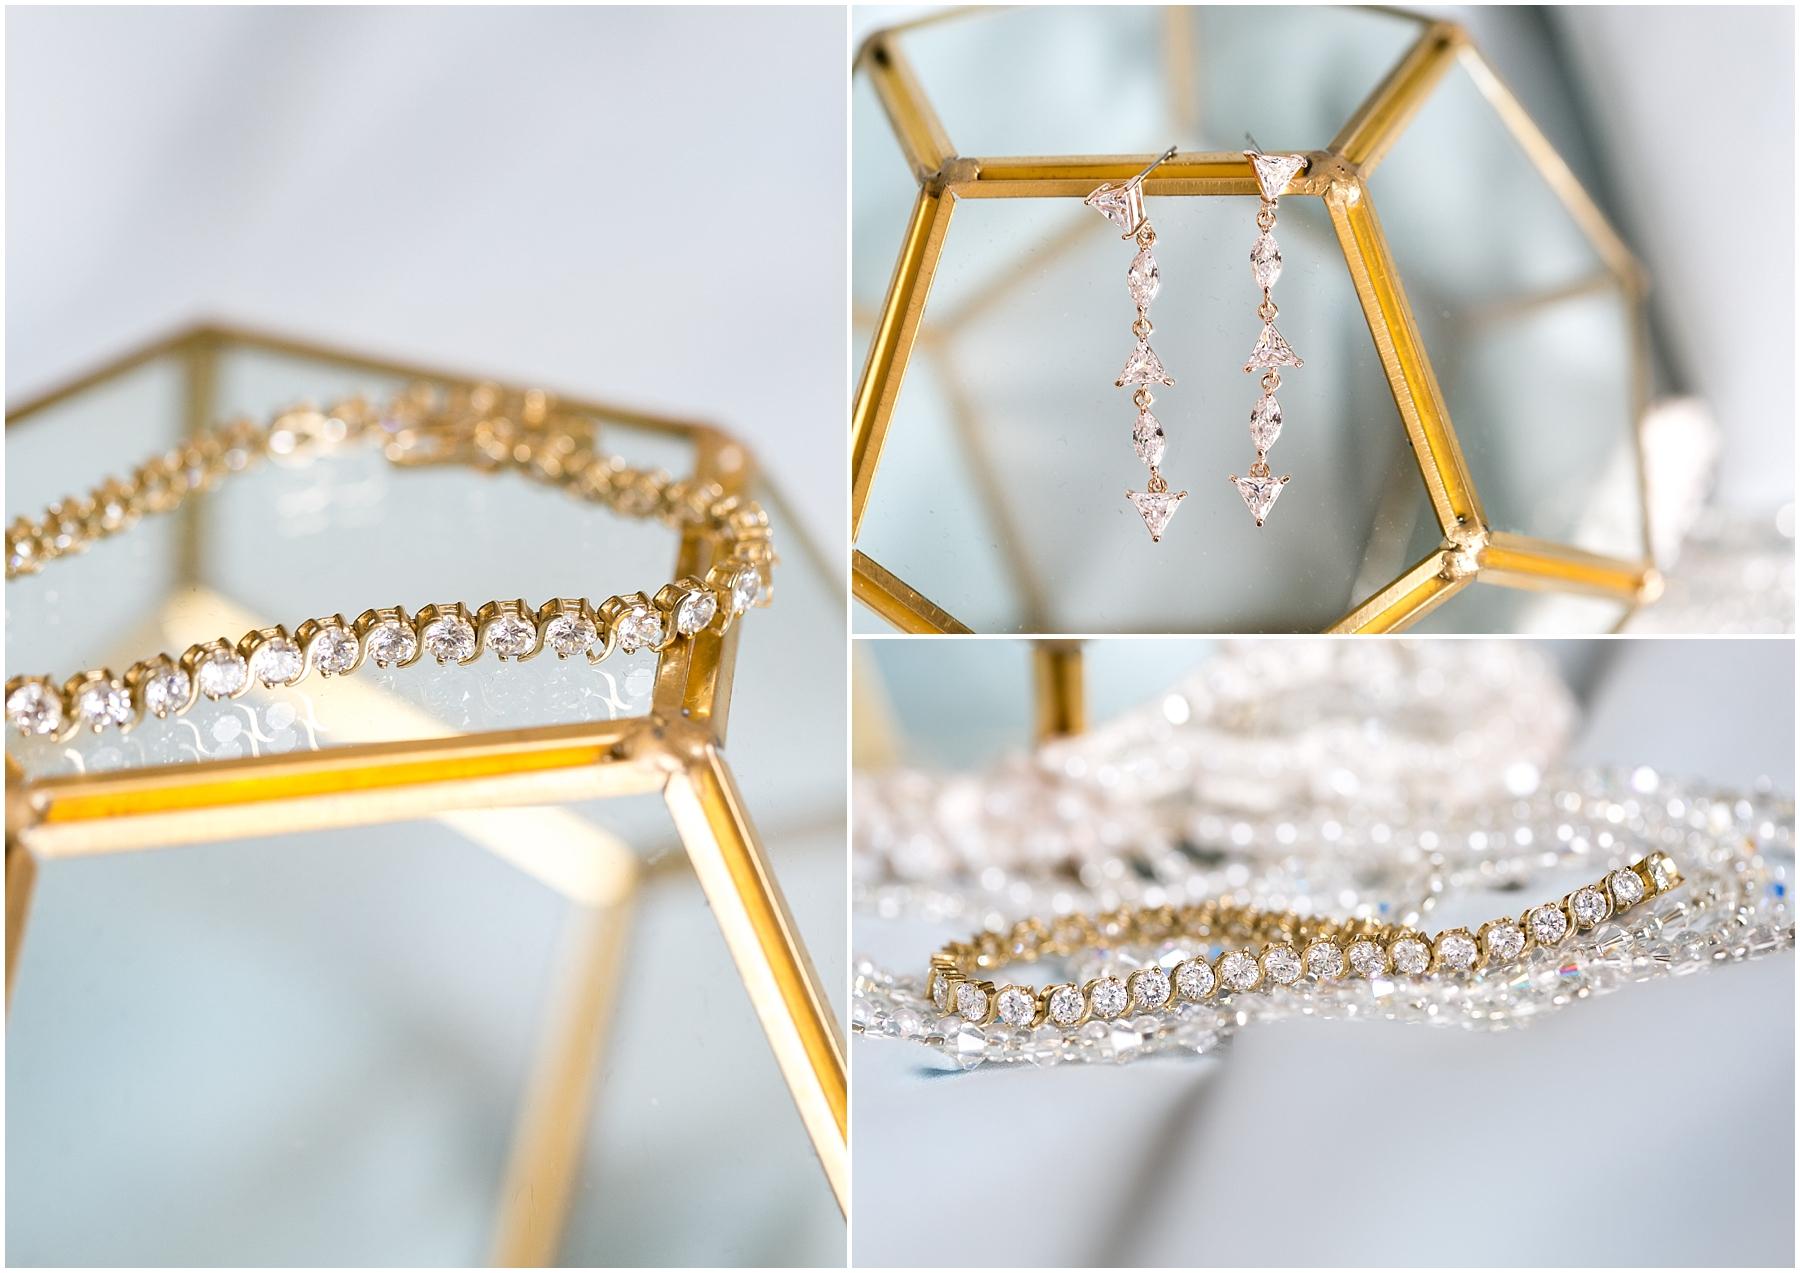 virginia beach wedding photography, wedding details, rose gold wedding decor